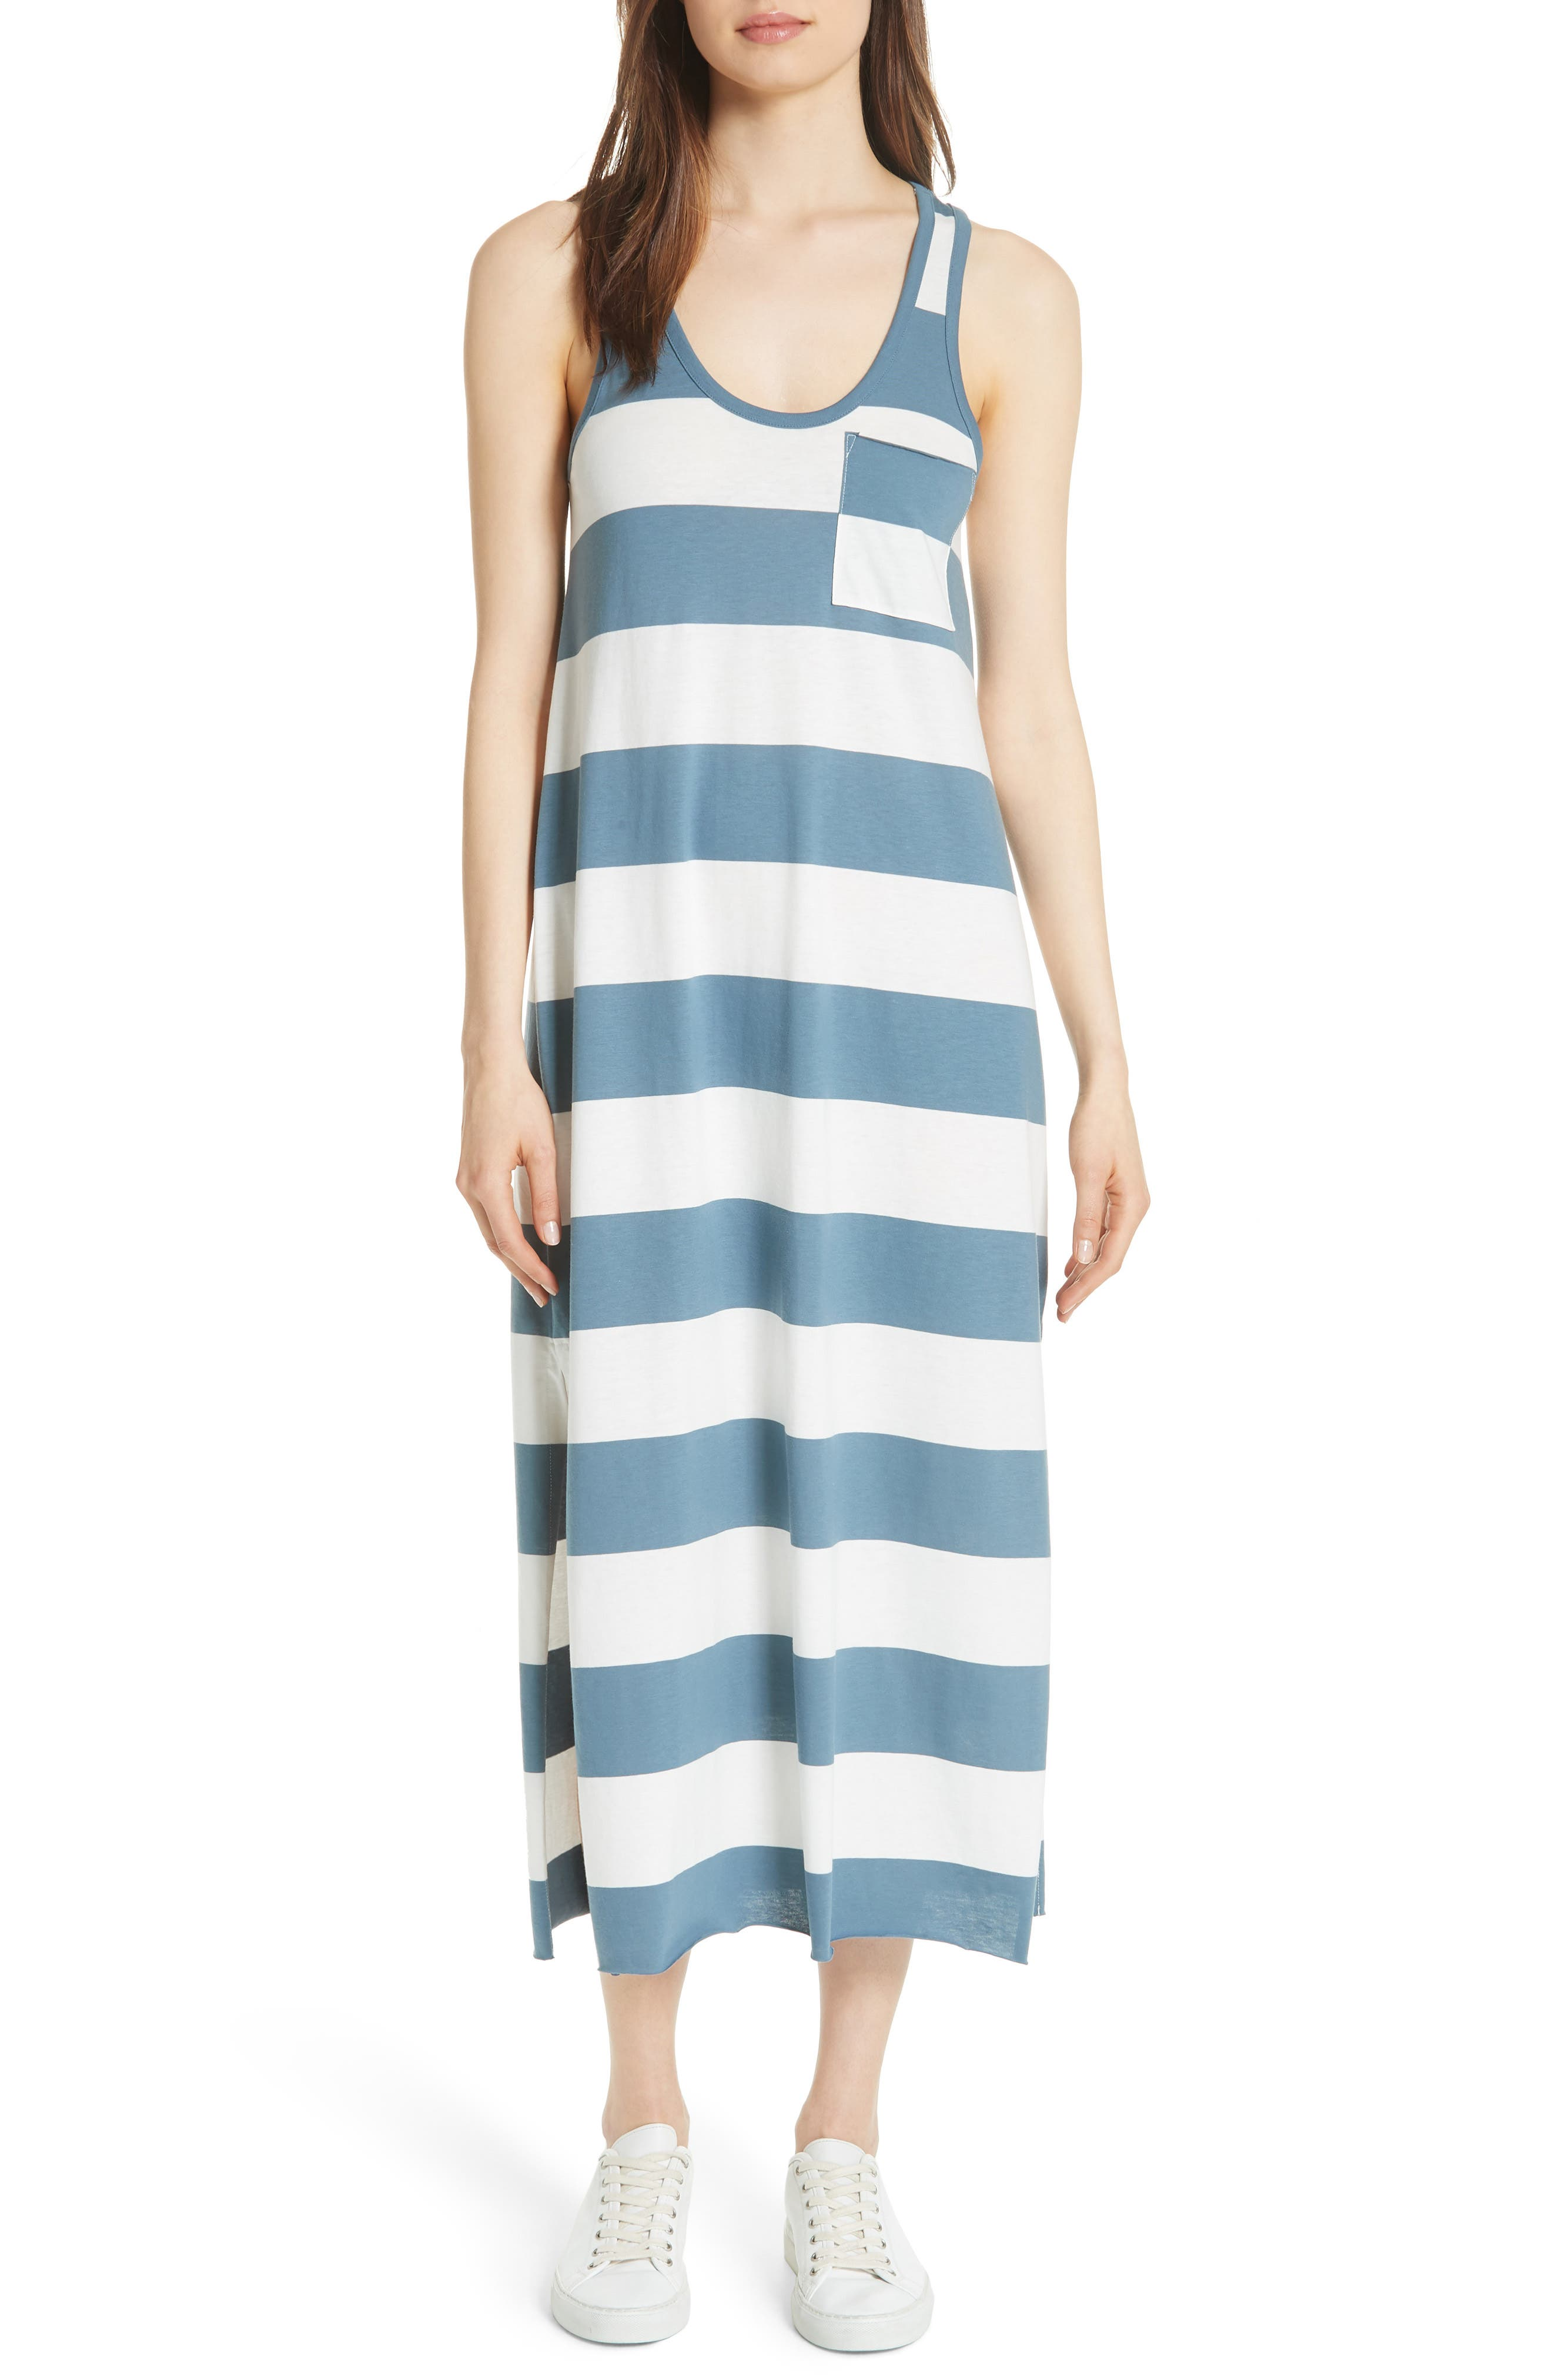 ATM Anthony Thomas Melillo Stripe Mercerized Jersey Dress (Nordstrom Exclusive)